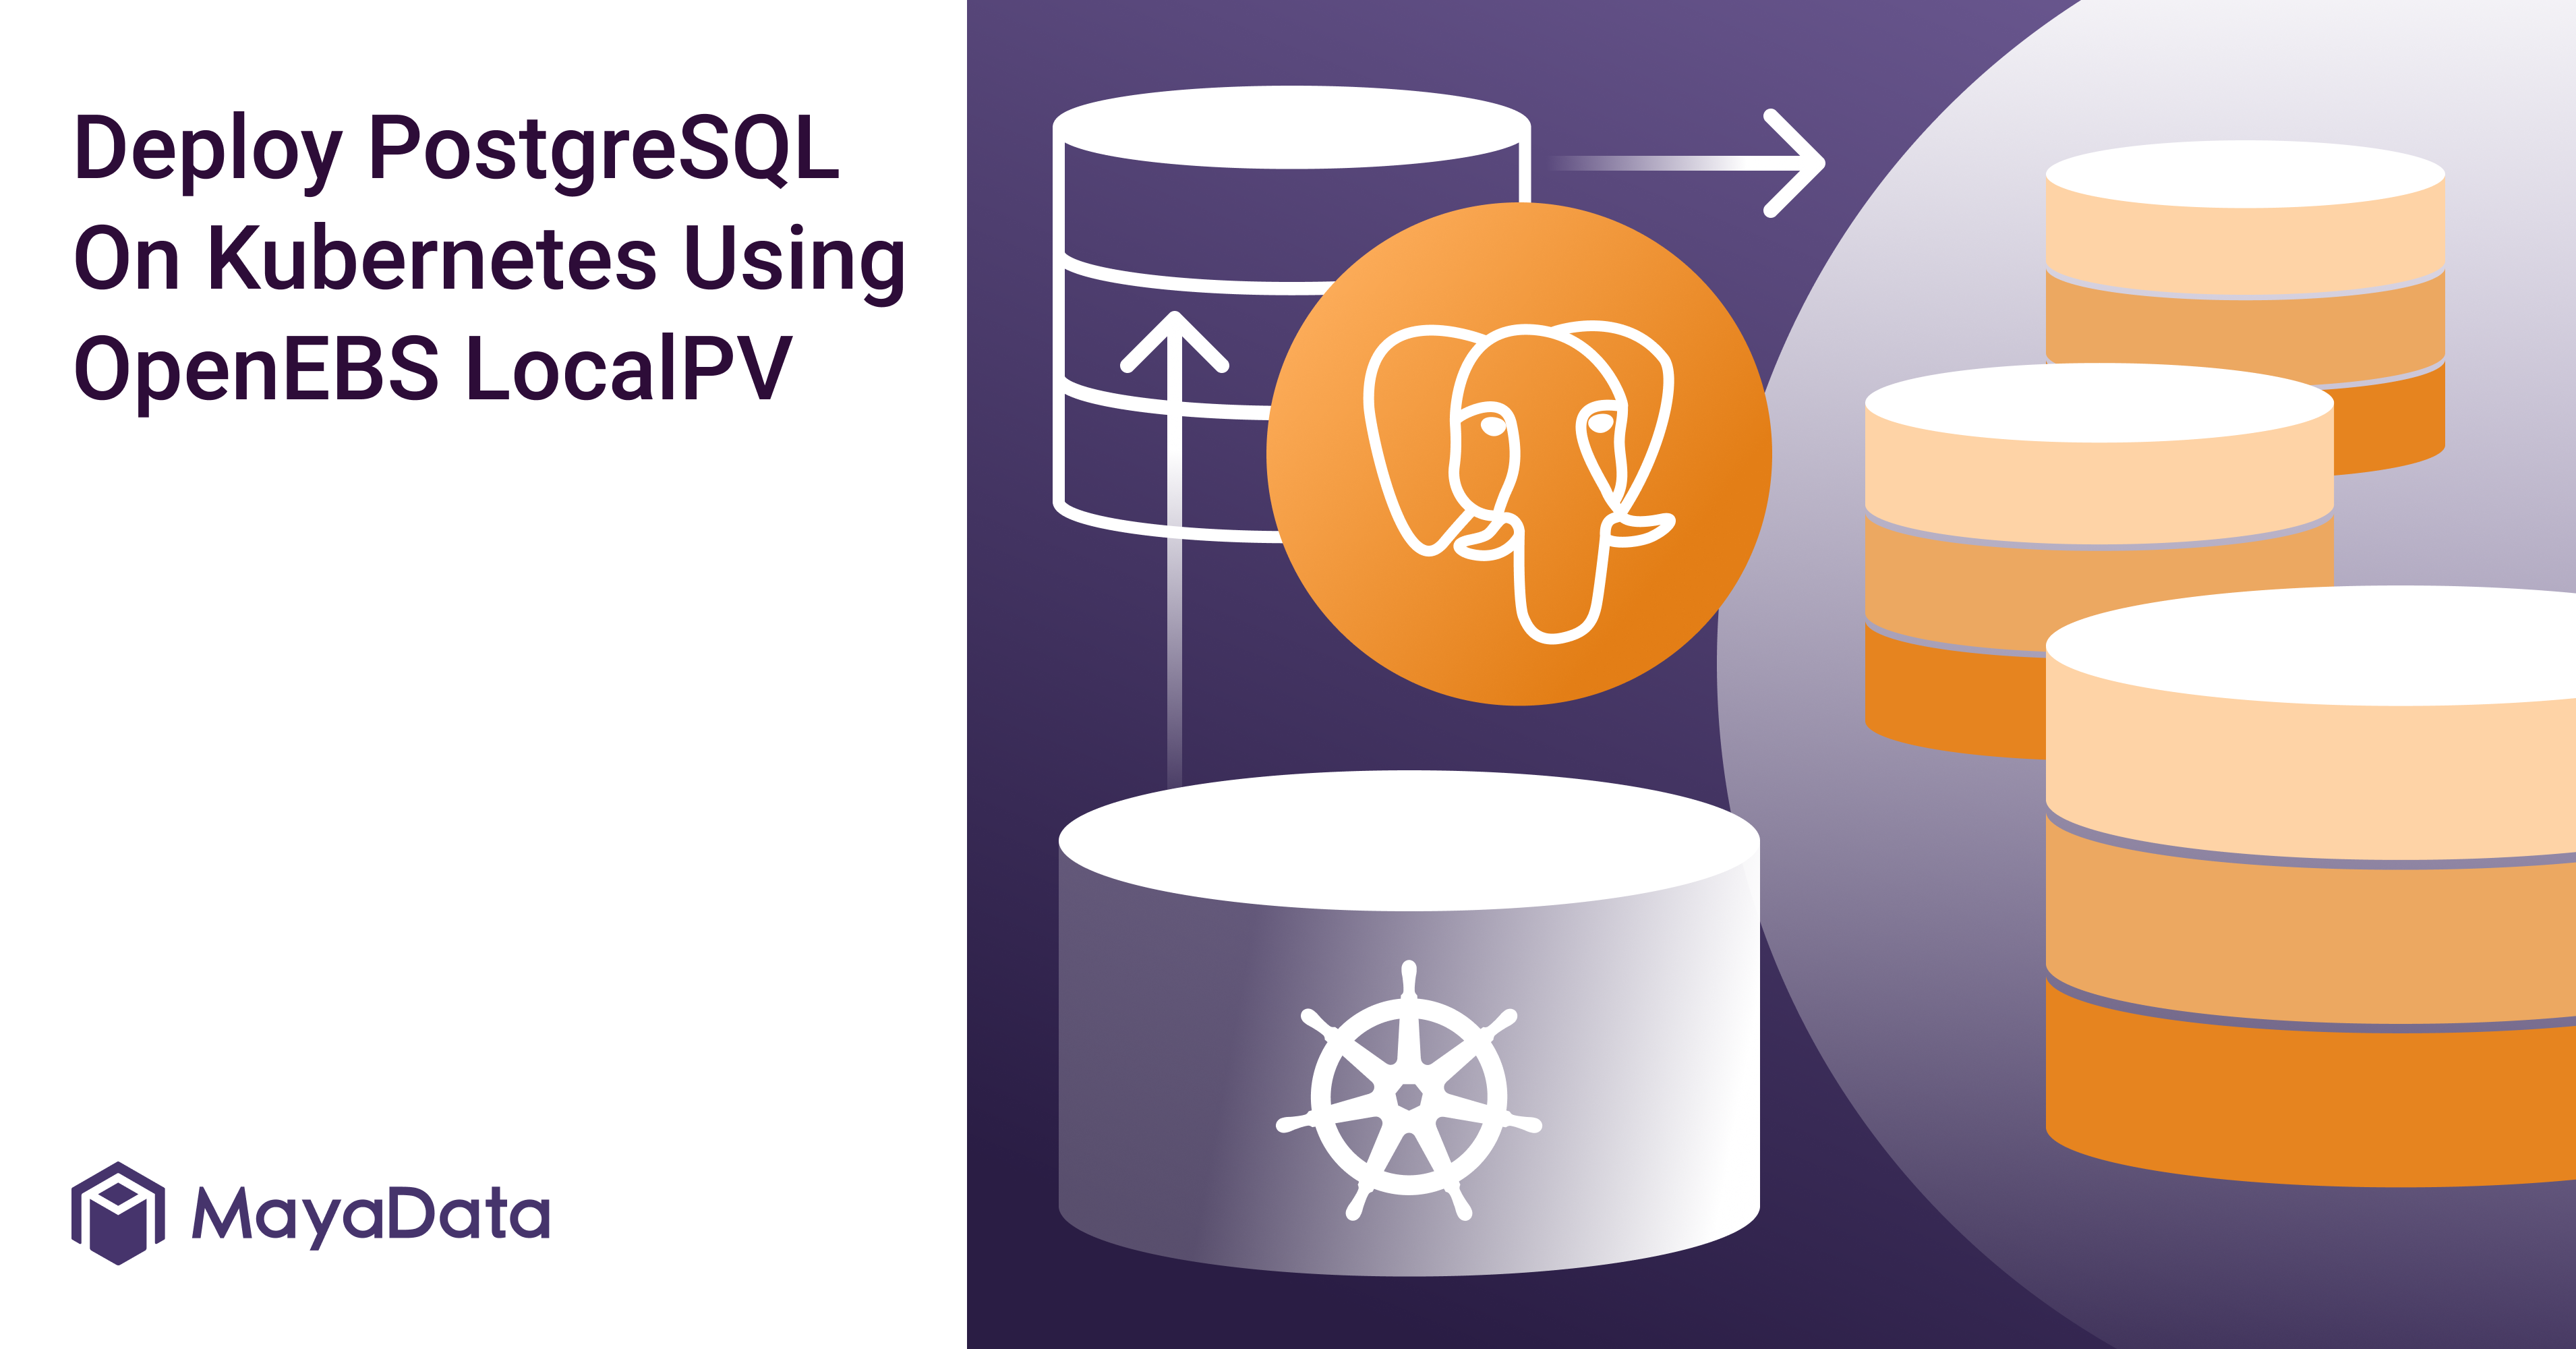 Deploy PostgreSQL On Kubernetes Using OpenEBS LocalPV